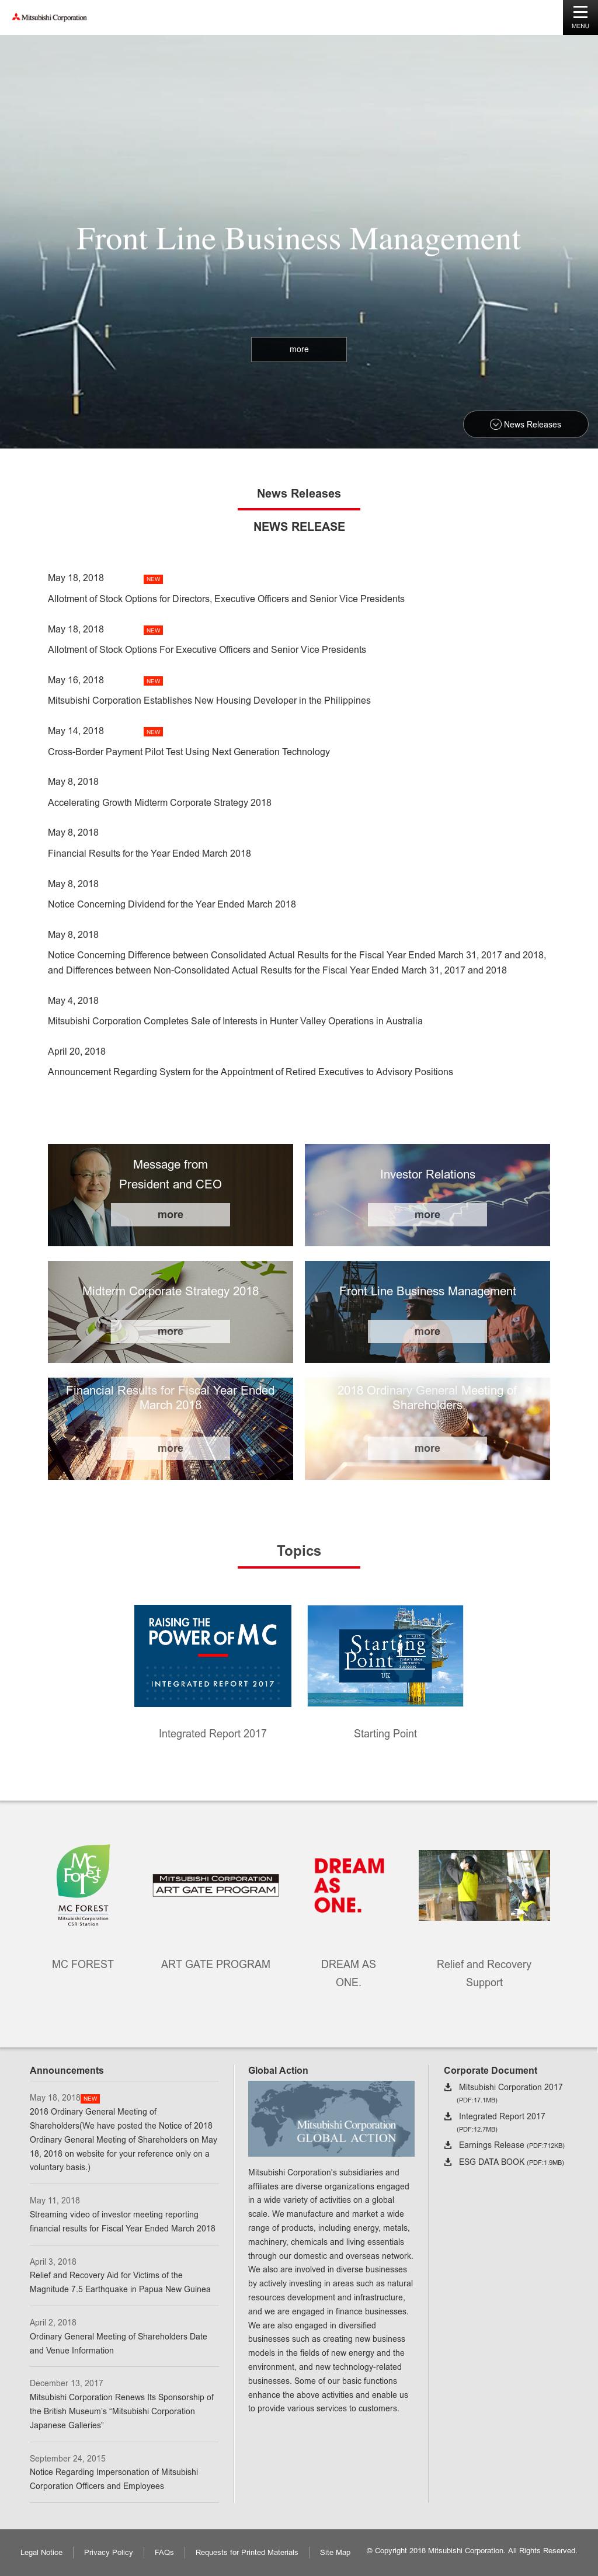 Mitsubishi Competitors, Revenue and Employees - Owler Company Profile